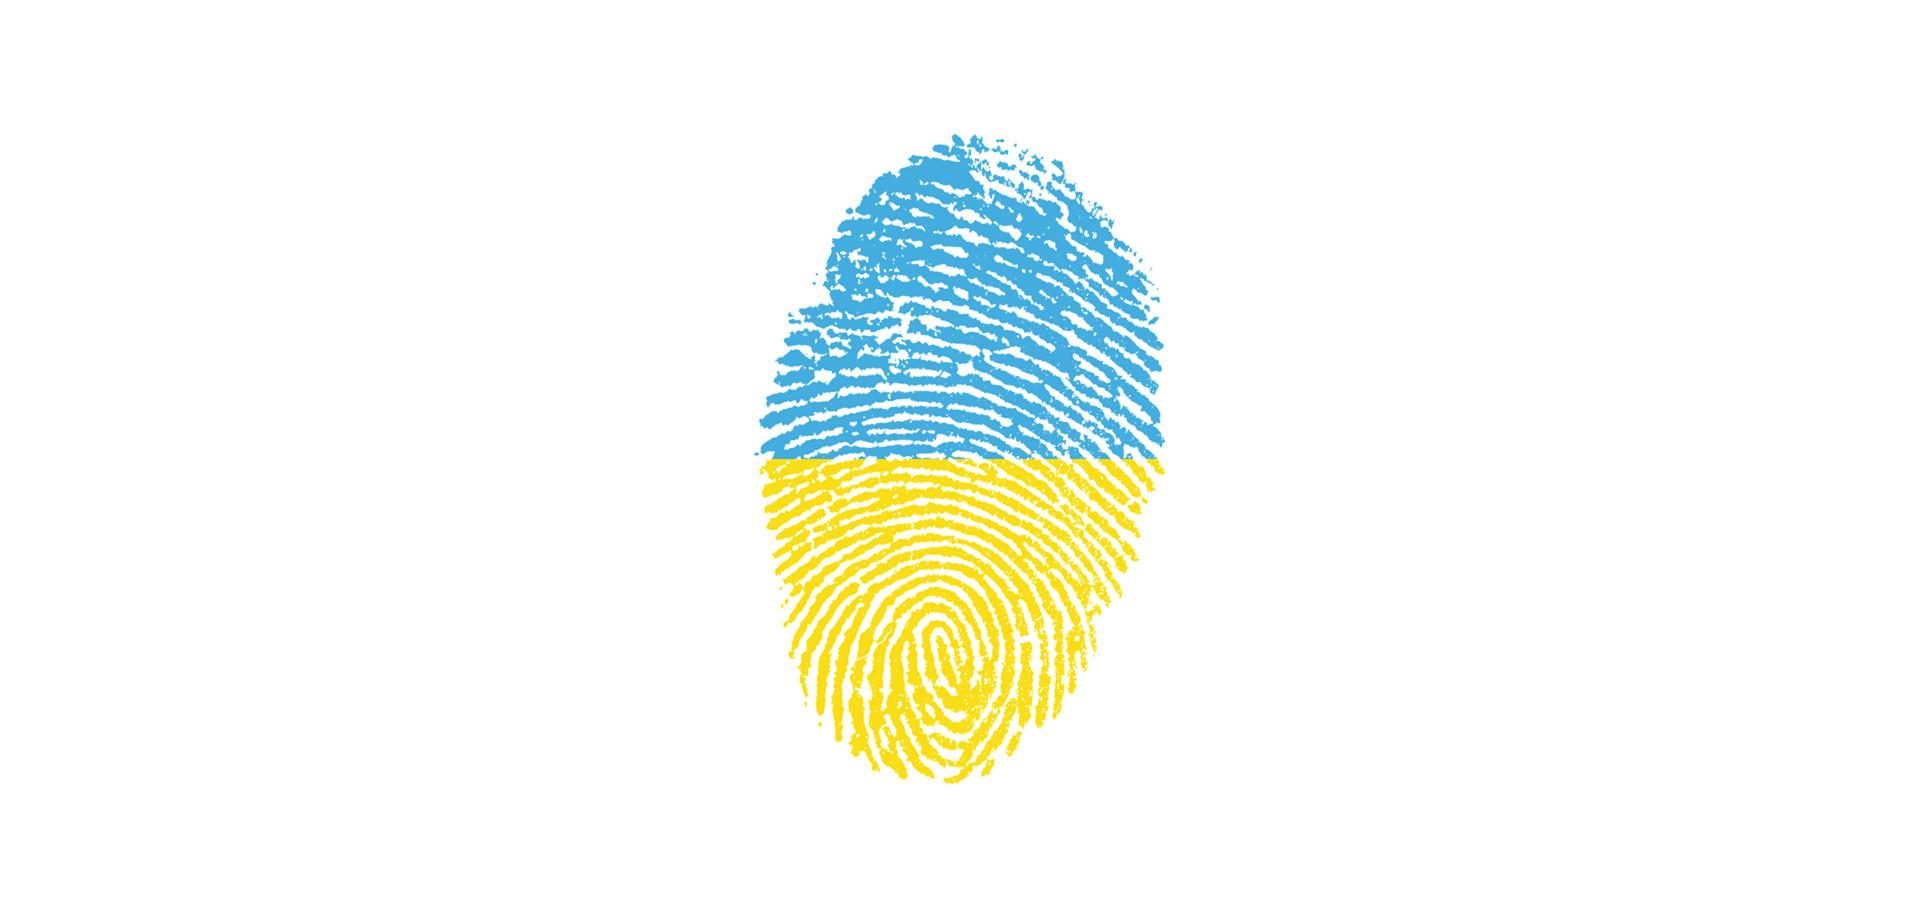 Ukrajina stráca kontrolu nad svojimi hackermi